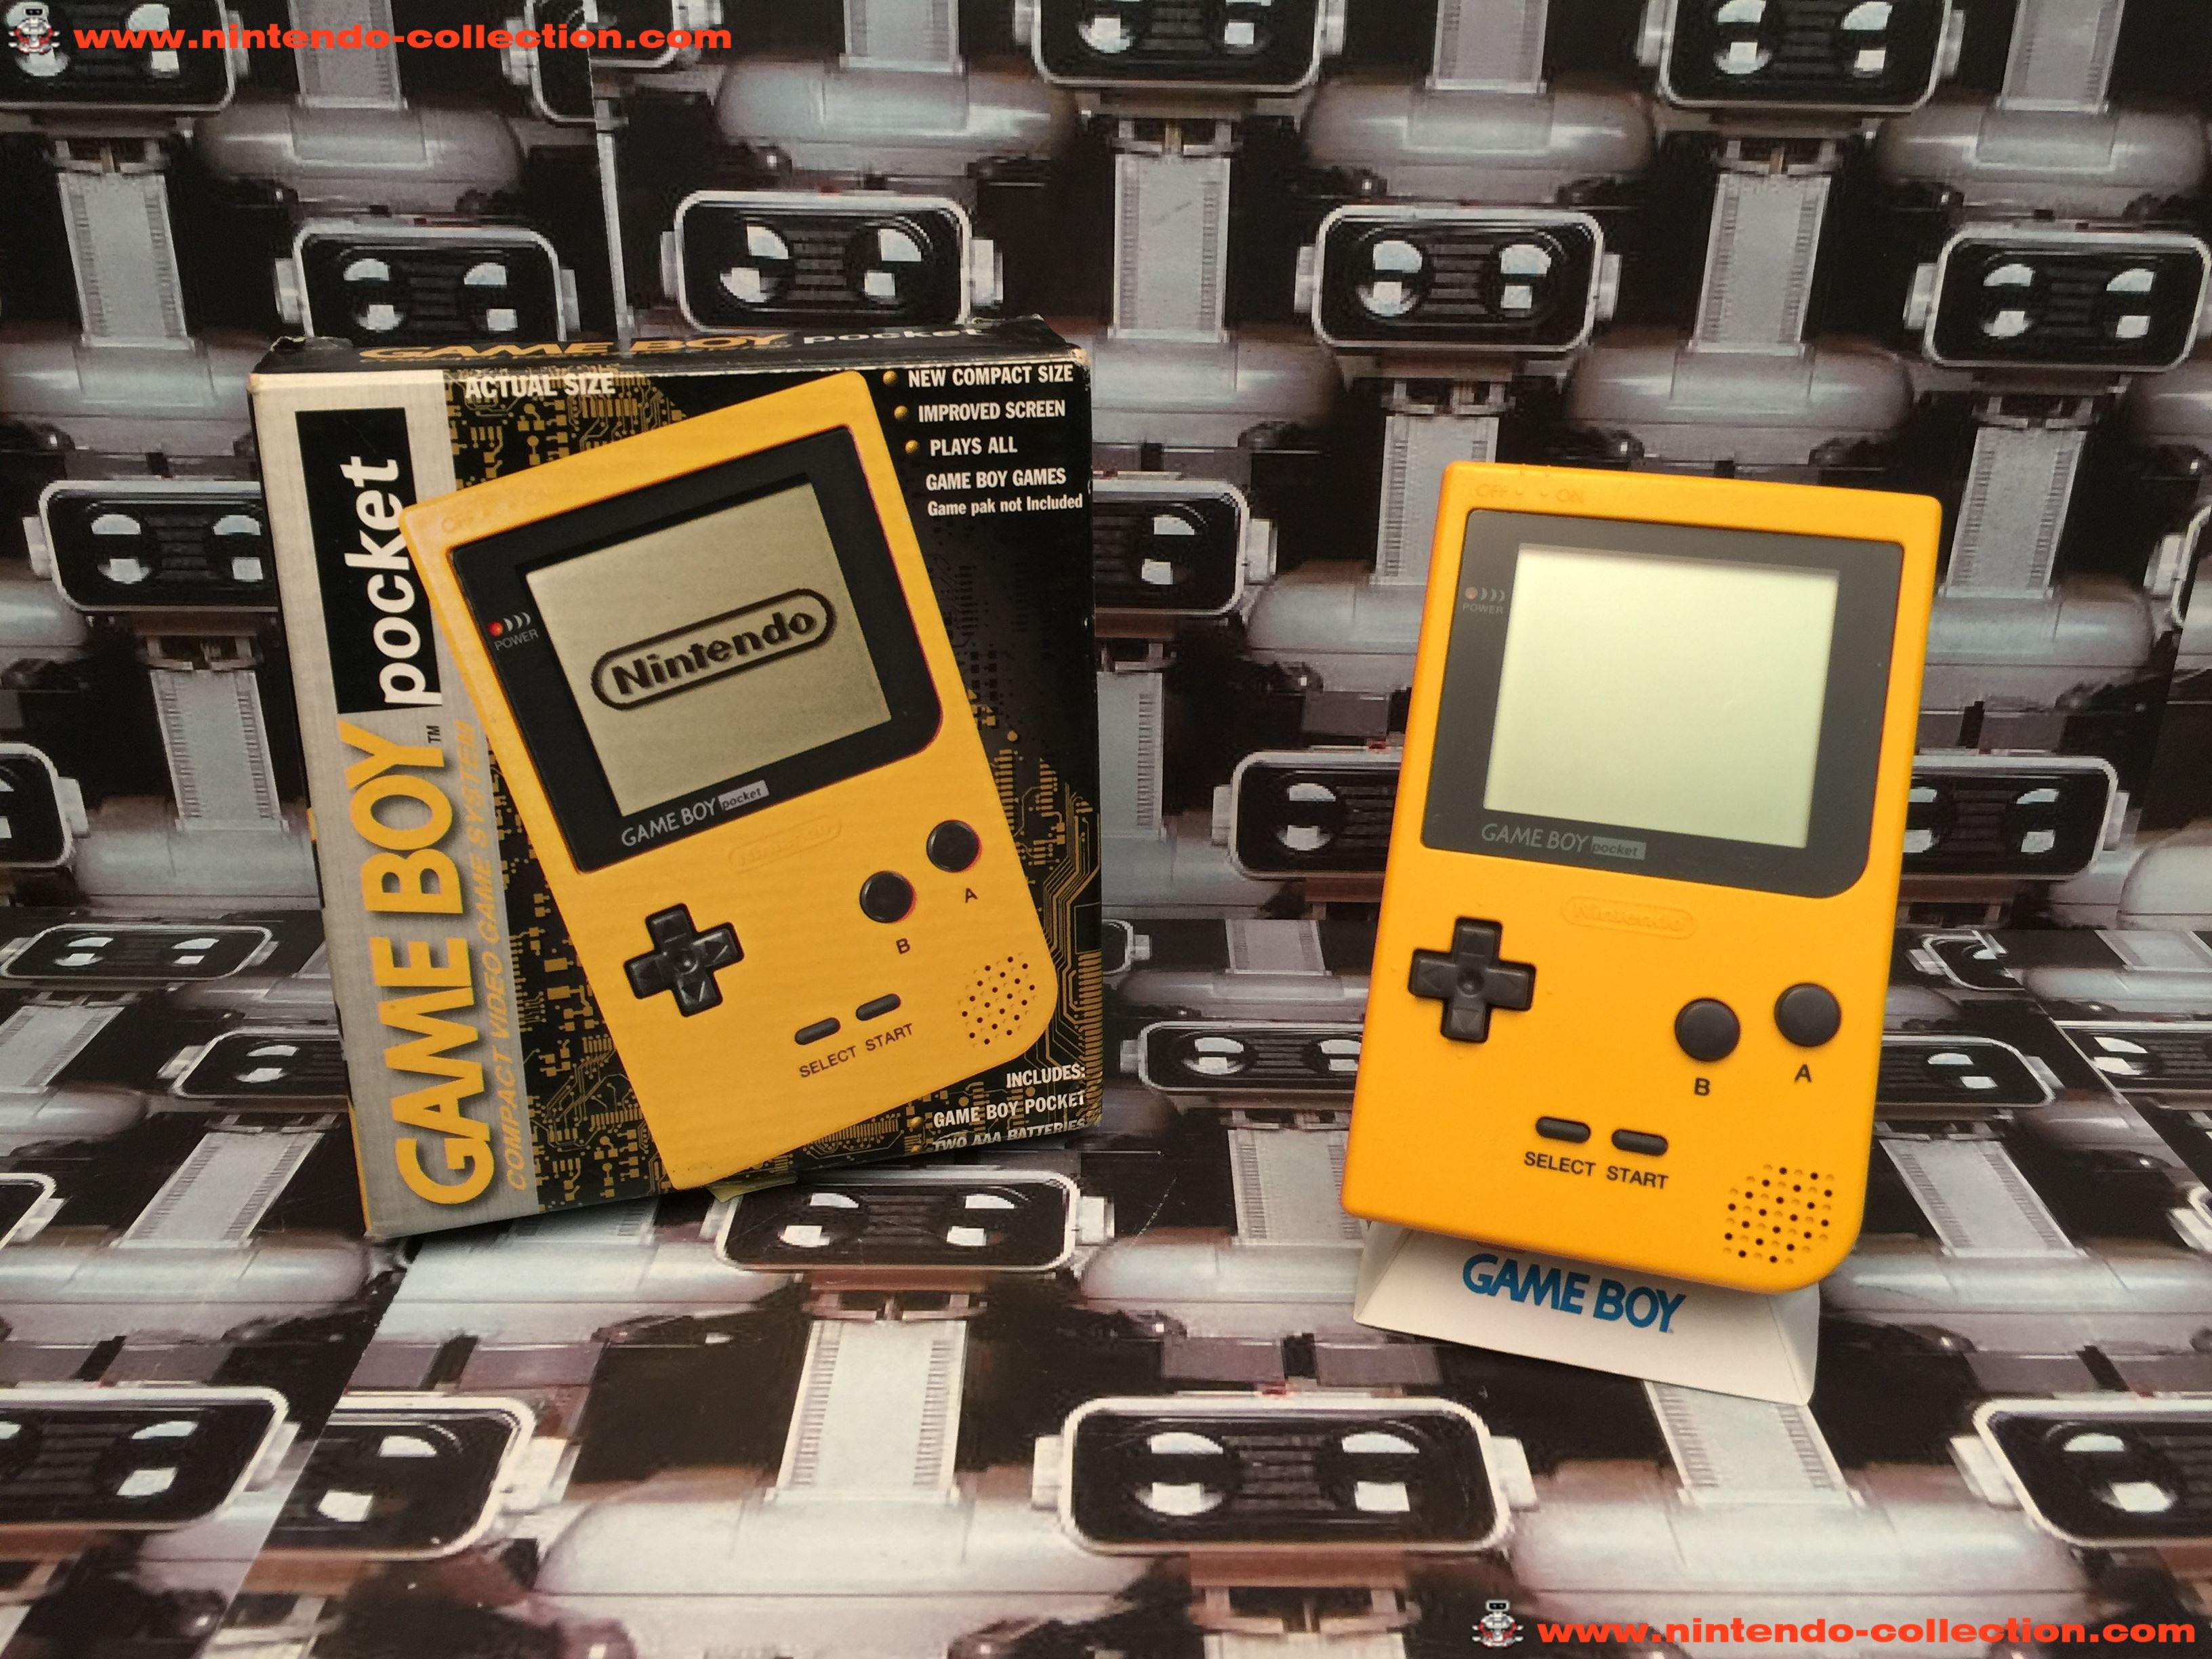 www.nintendo-collection.com - Gameboy GB Pocket Yellow Jaune en boite in box European Europe